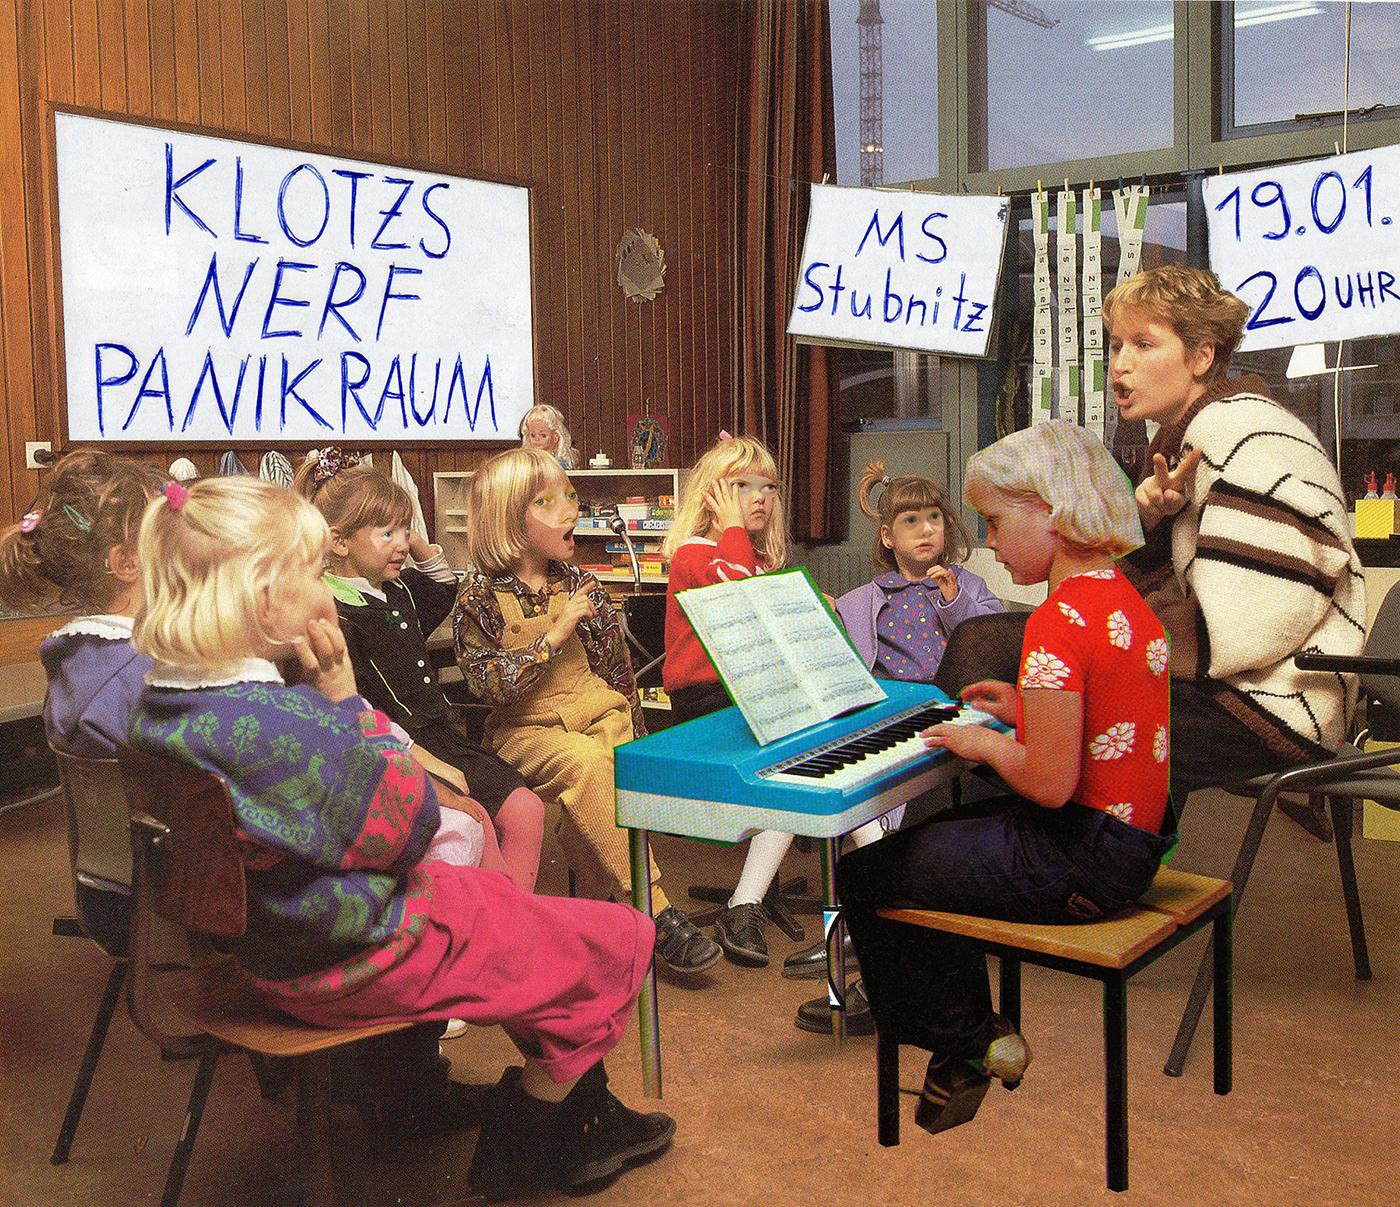 Preview: KLOTZS, NERF & PANIKRAUM